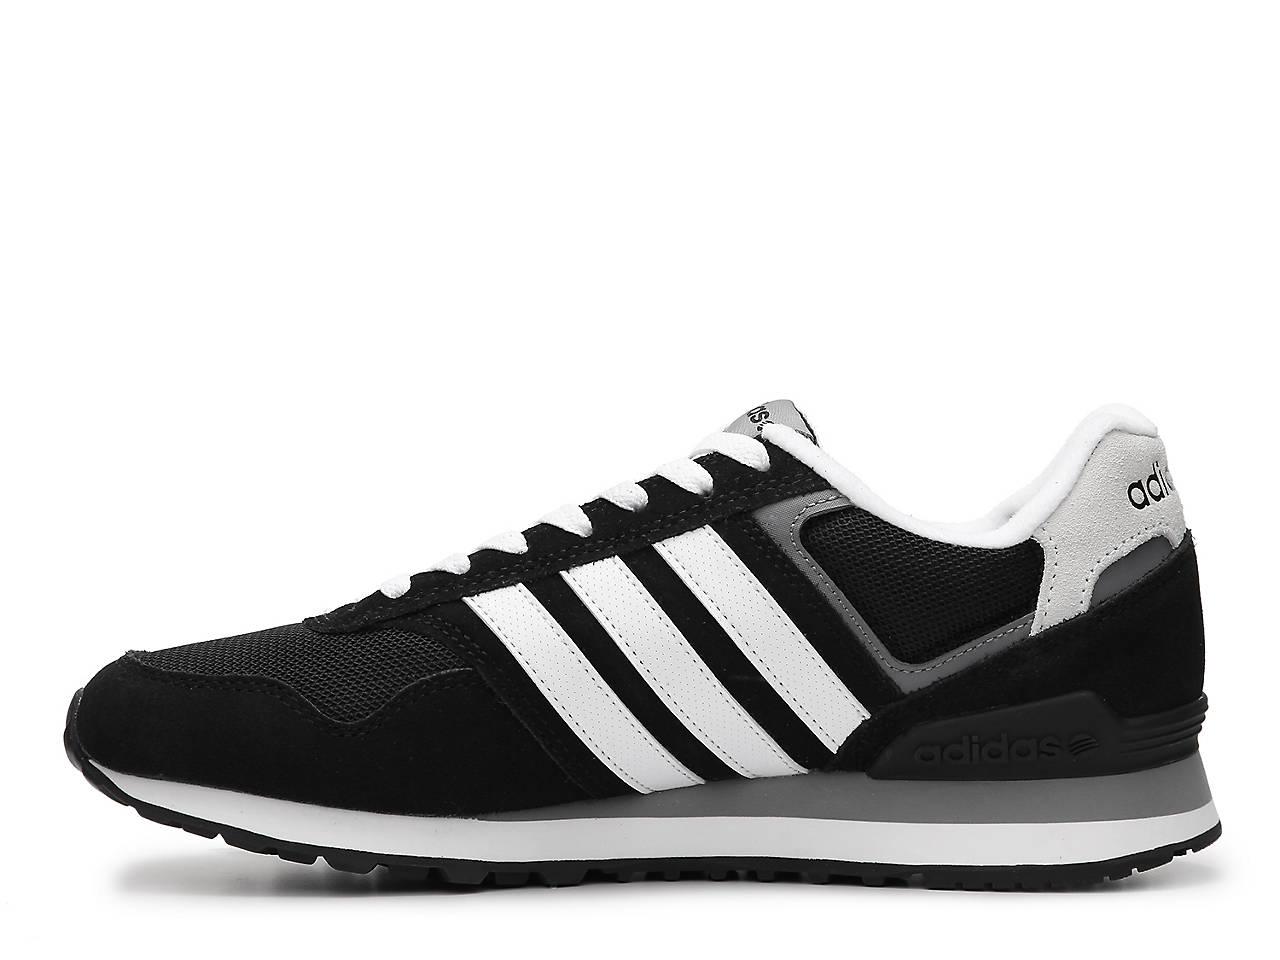 4bad77c7439 adidas 10k Retro Run Sneaker - Men s Men s Shoes